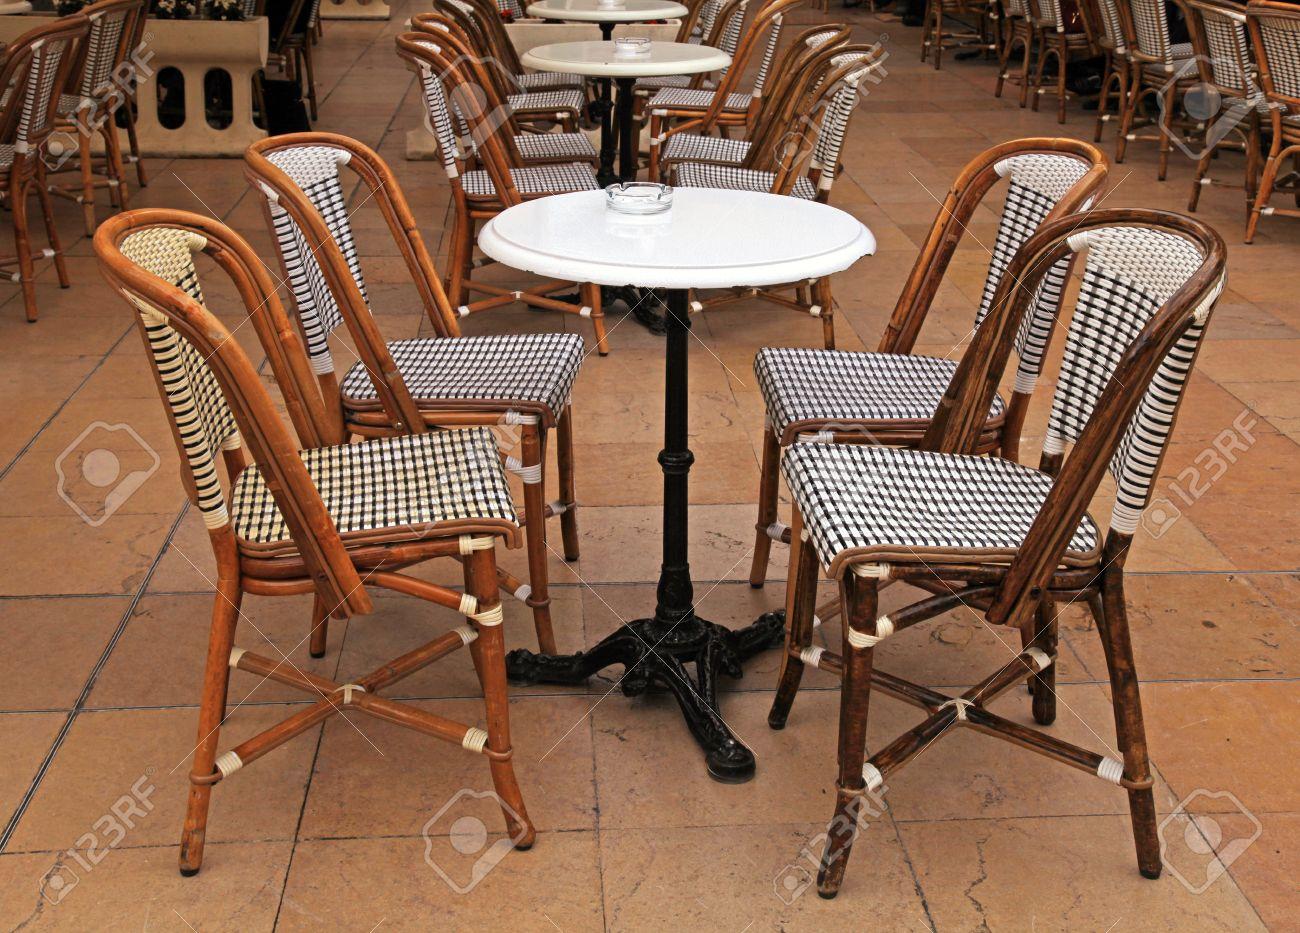 Sedie Francesi Da Giardino : Immagini sedie antiche francesi coppia di sedie antiche carlo x